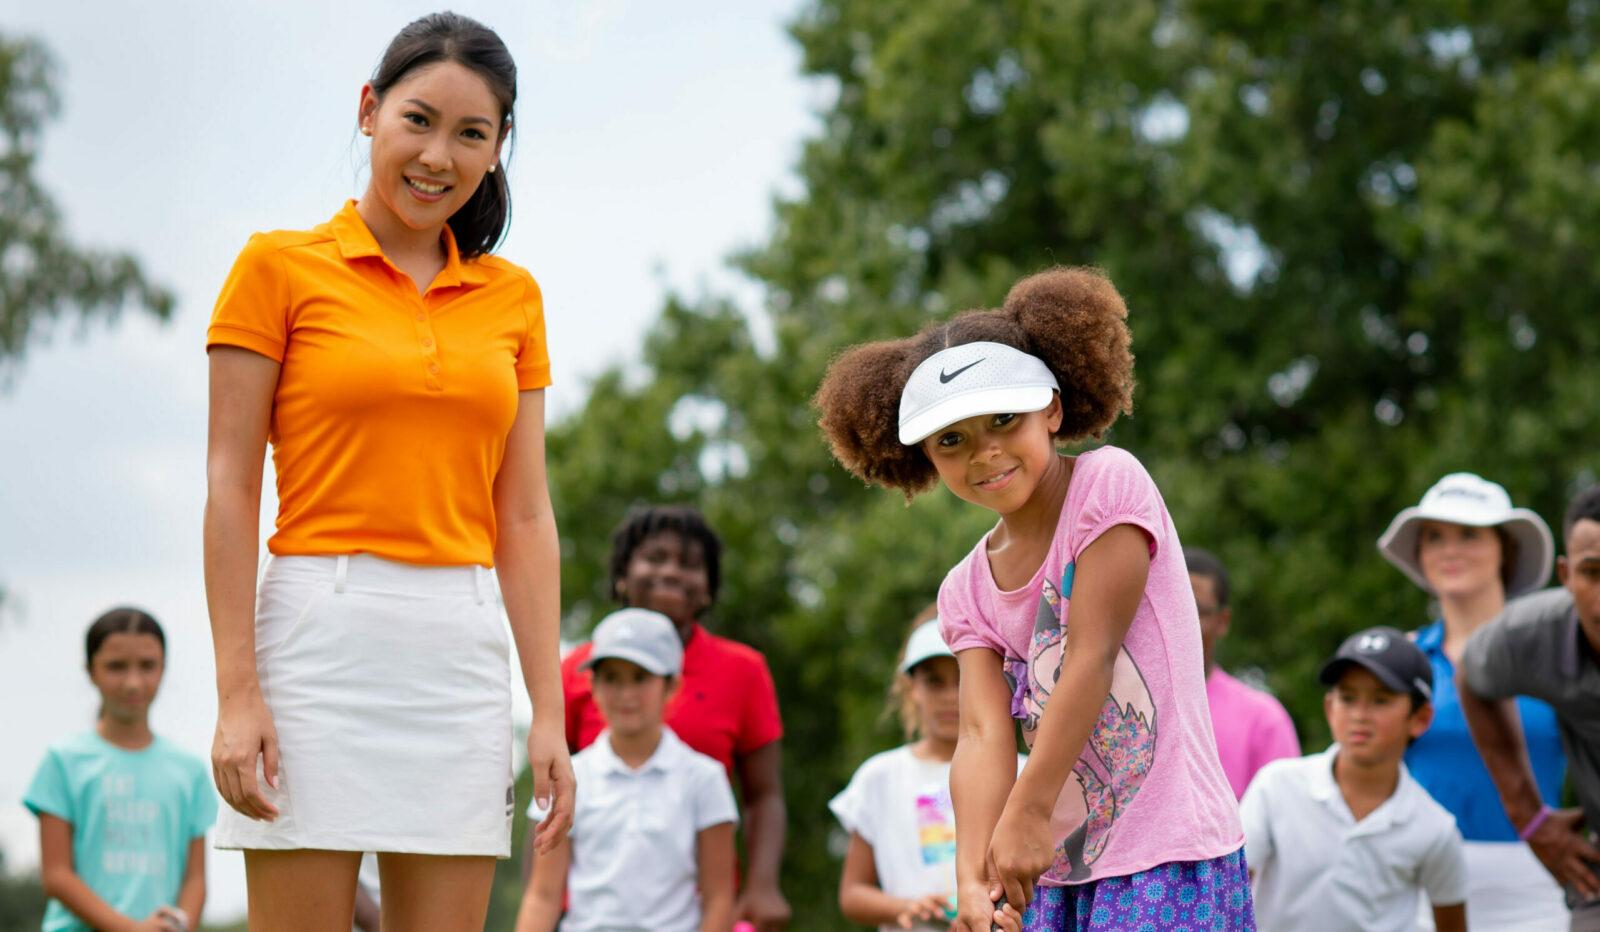 Increasing Diversity in Golf